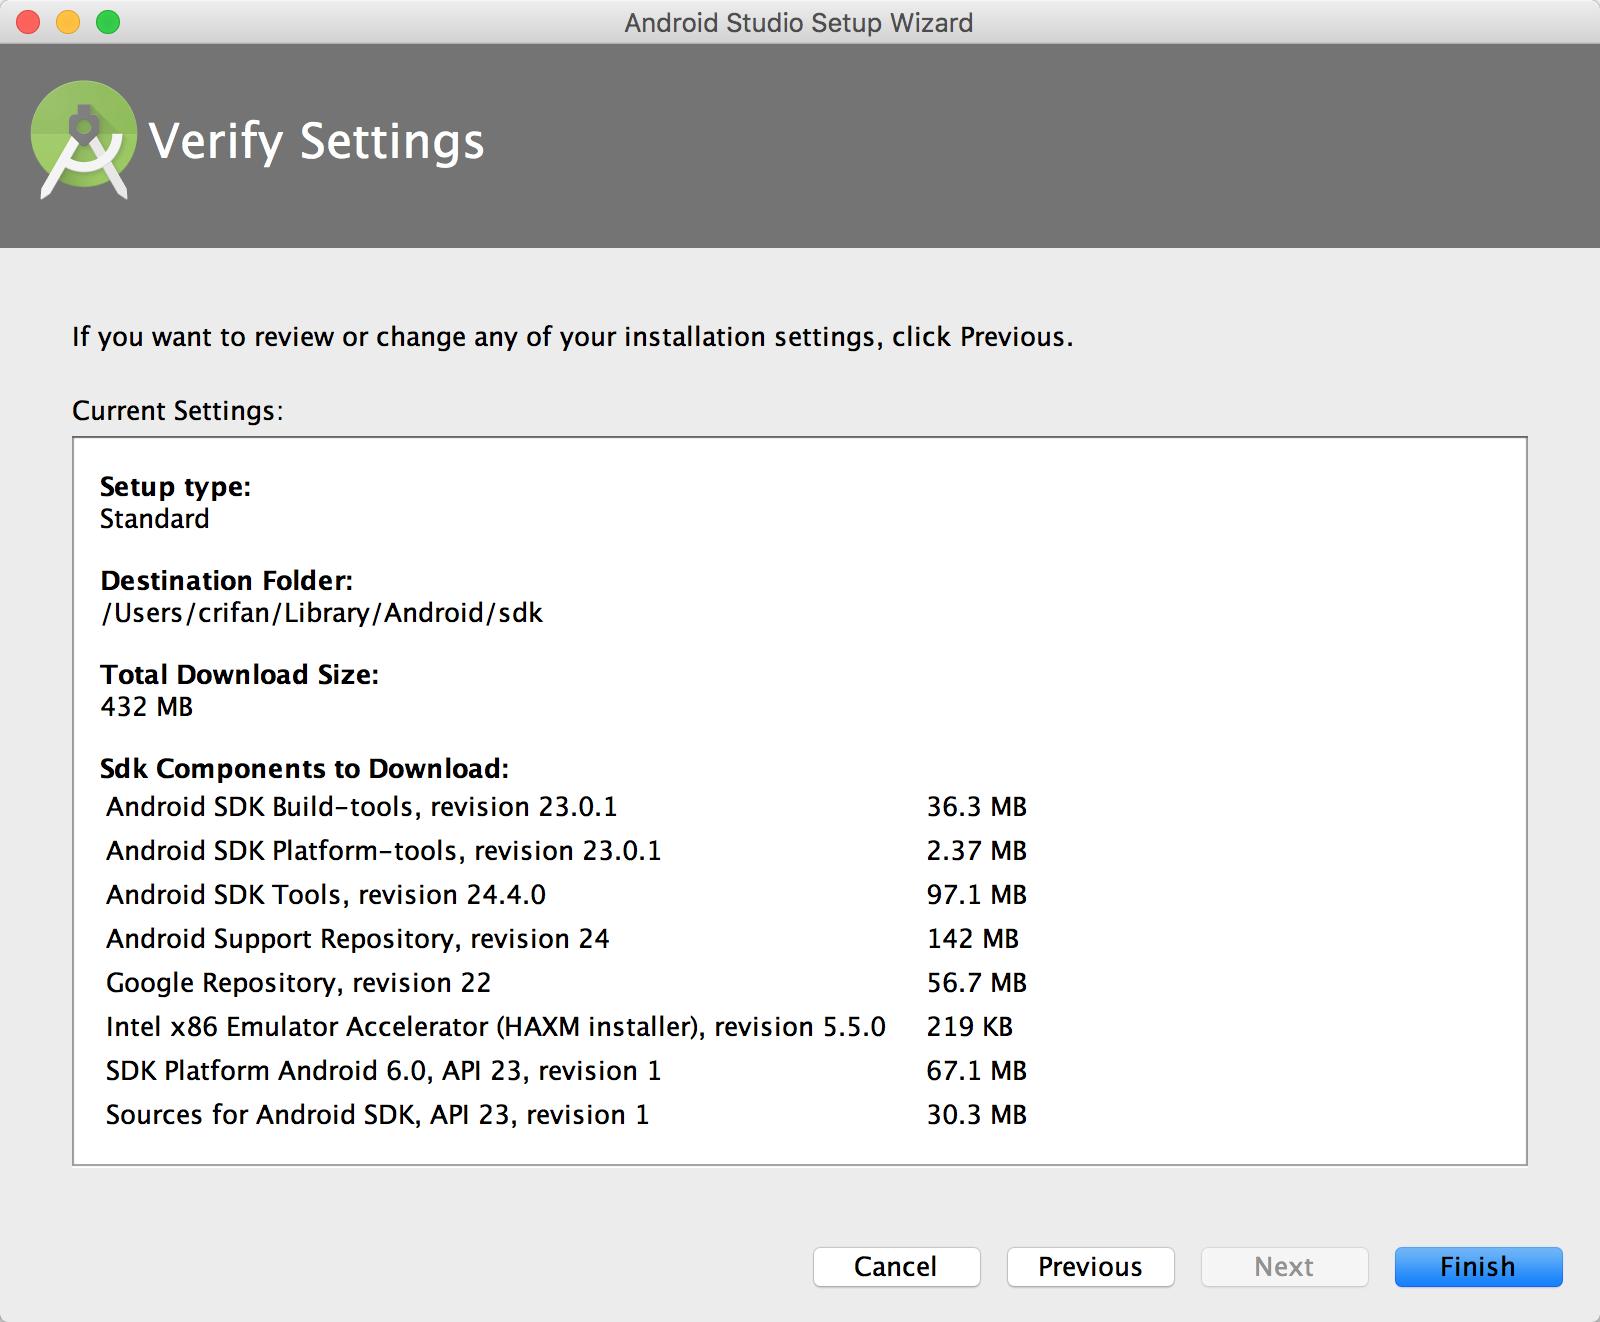 verify setting